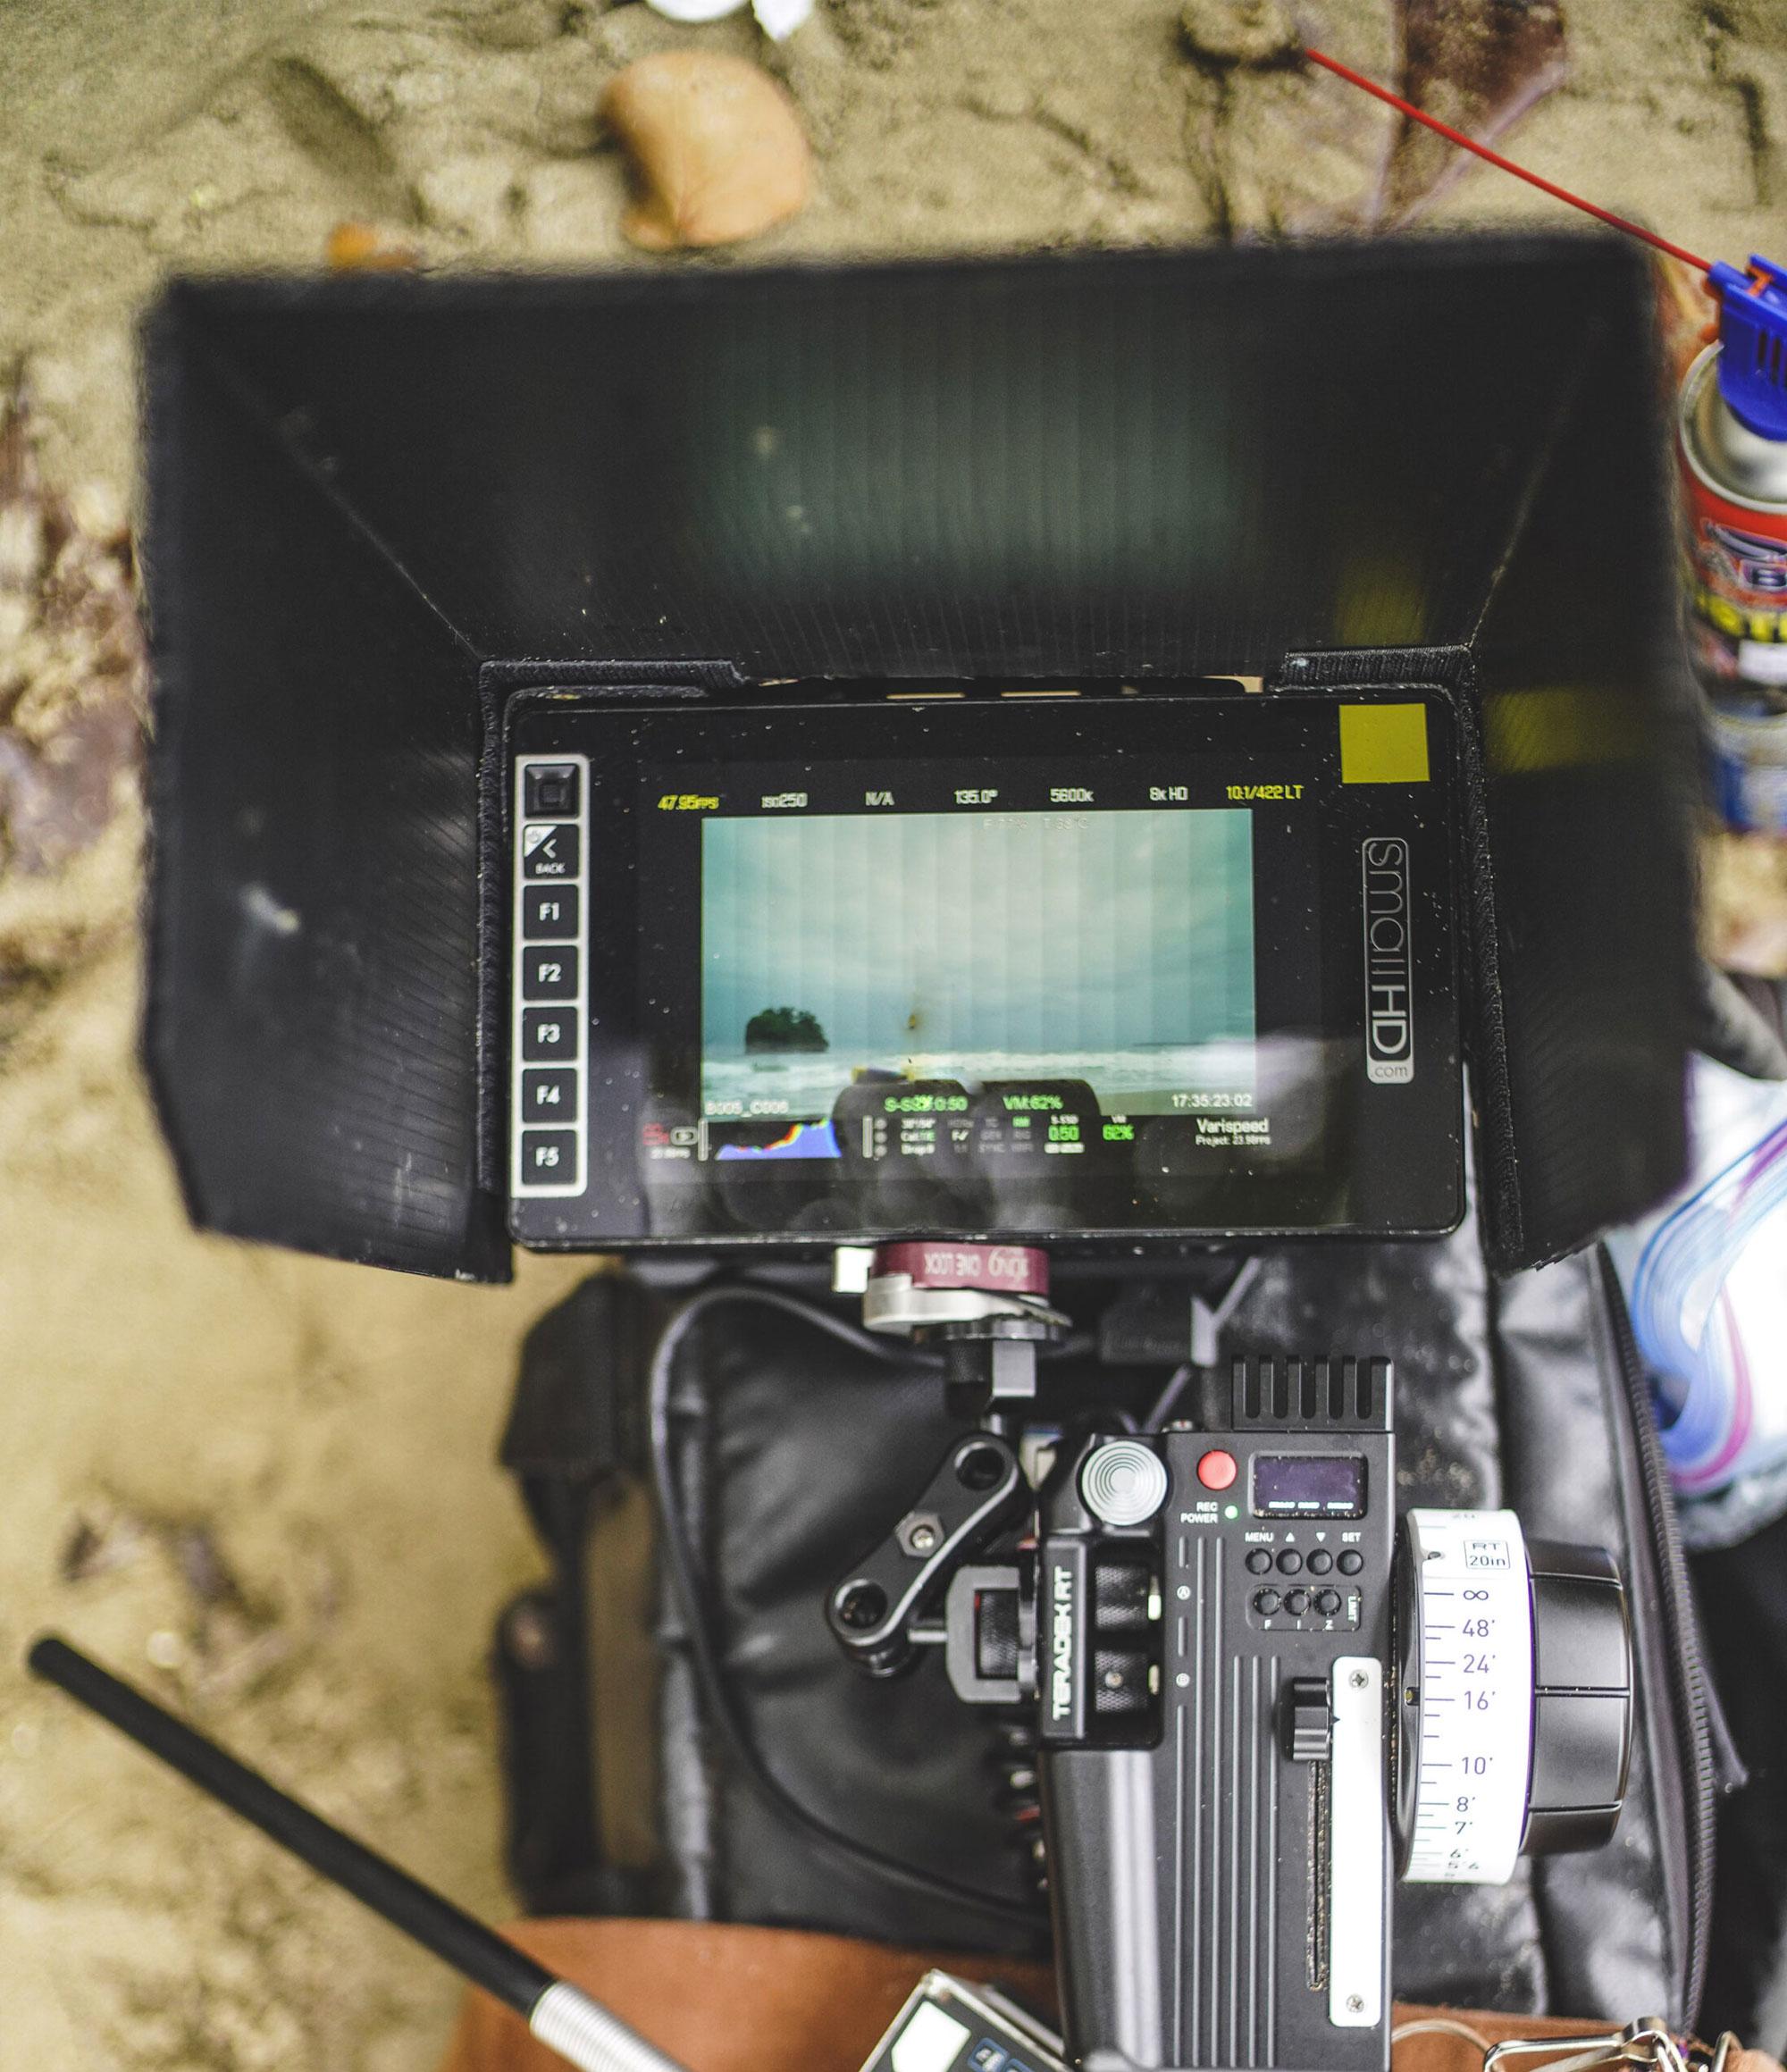 Adventurer and filmmaker Renan Ozturk on why he uses Teradek 4